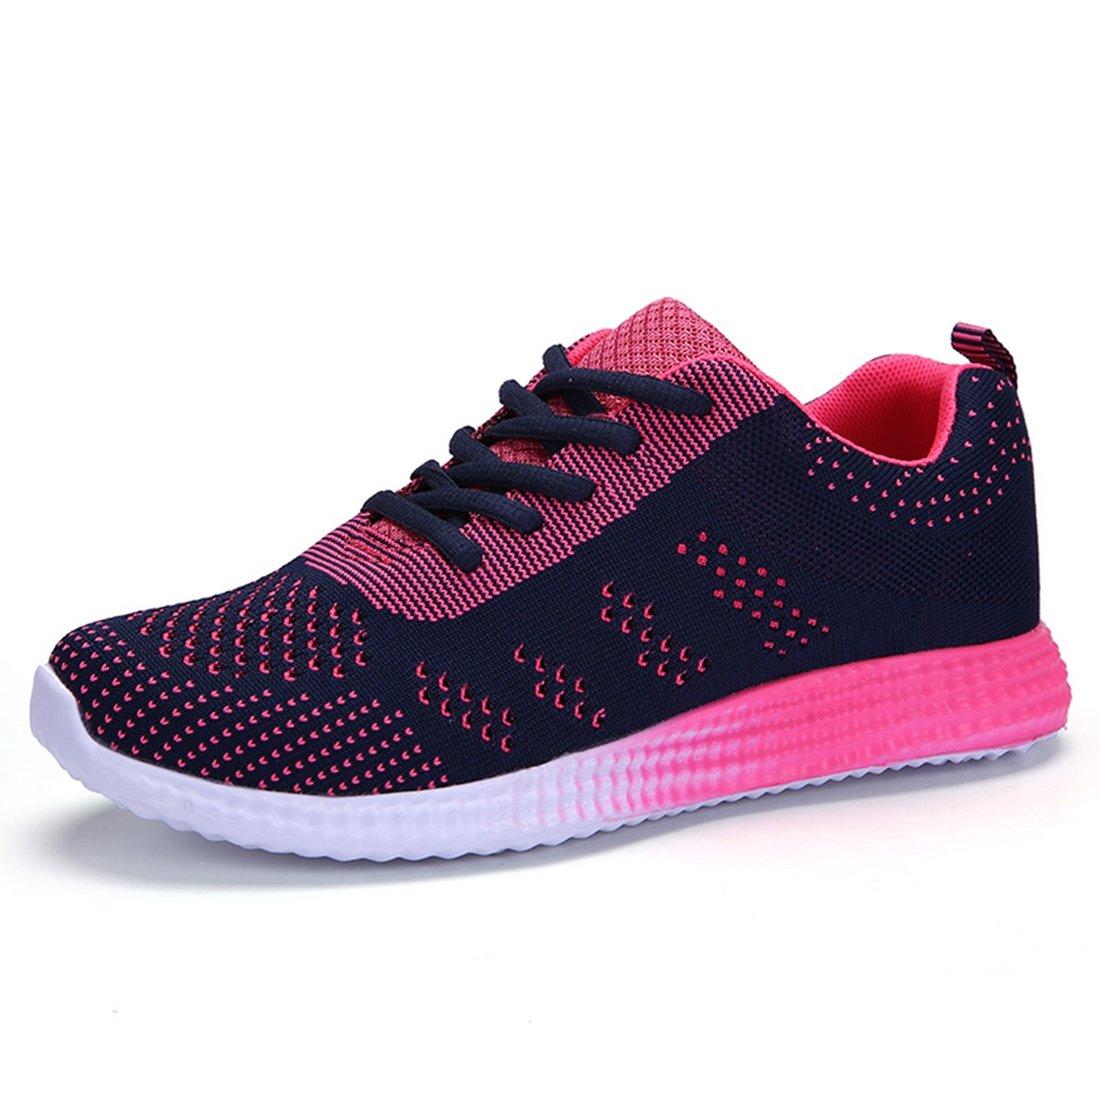 Women Quick Drying Mesh Water Aqua Shoes Breathable Hiking Running Shoes Blue 245mm:8.5 B(M) US Women/6.5 D(M) US Men